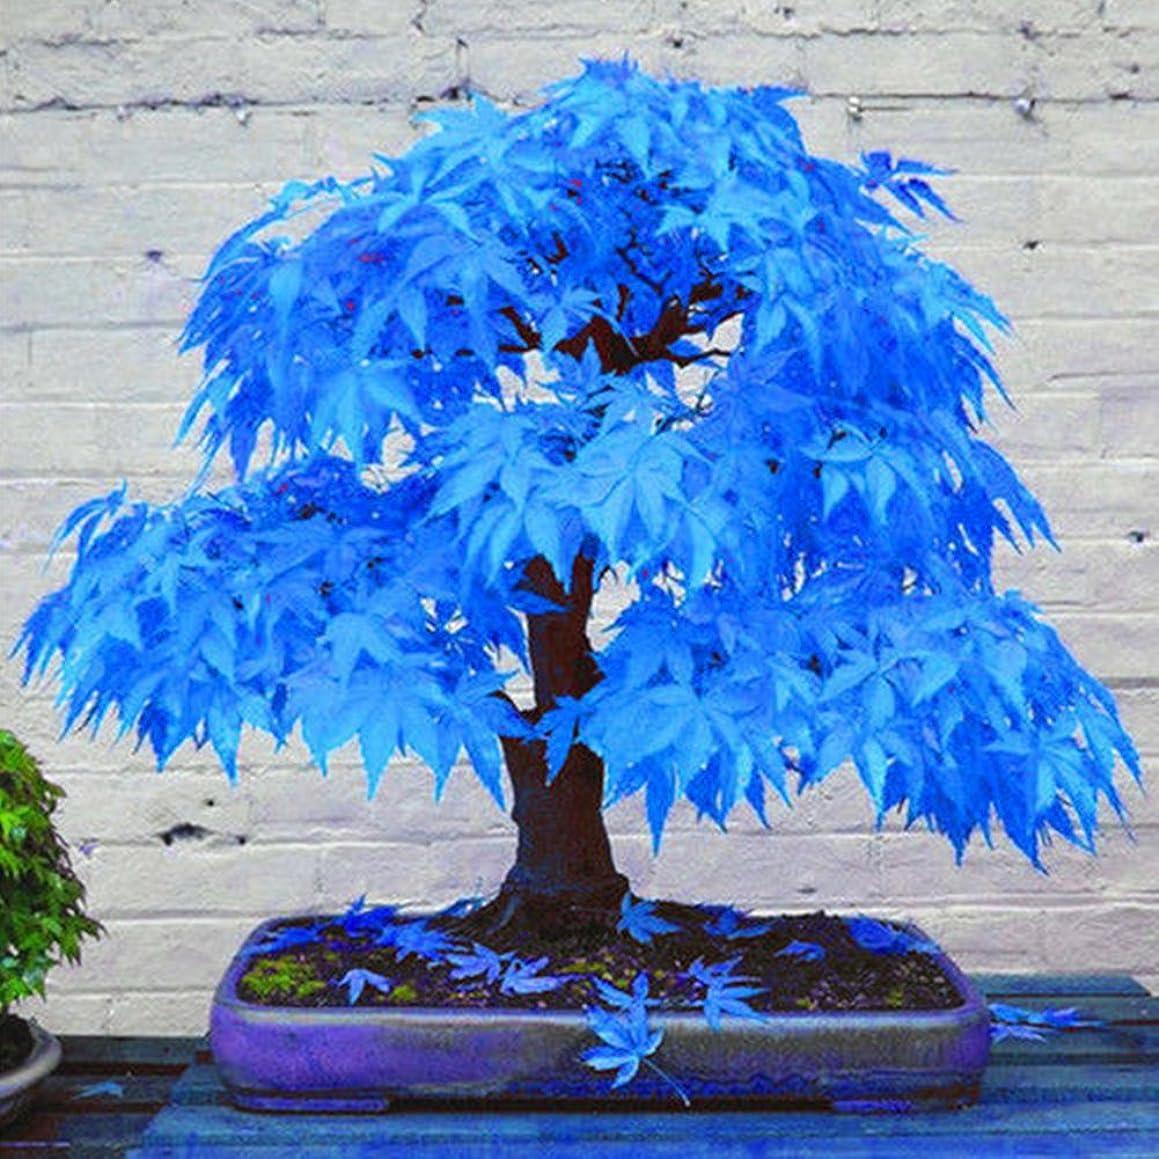 AT27clekca Blue Maple Seeds Repair Tool 20Pcs Beautiful Rare Blue Maple Seeds Bonsai Plants Garden Home Tree Decoration